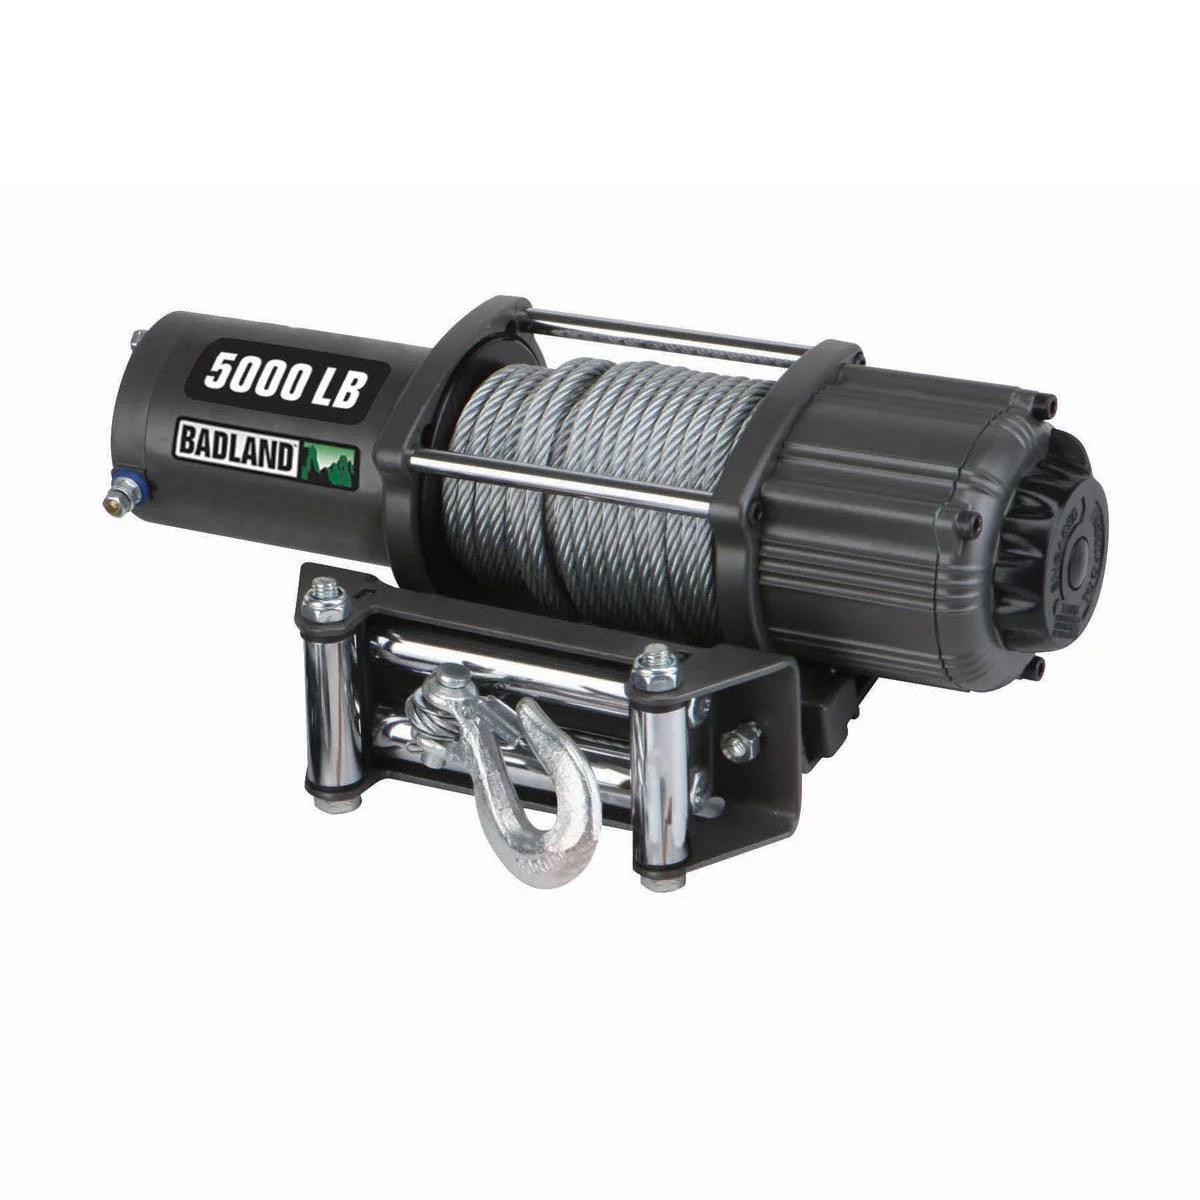 hight resolution of badland electric winch 5000 lb atv utility automatic load holding brake 61384 walmart com